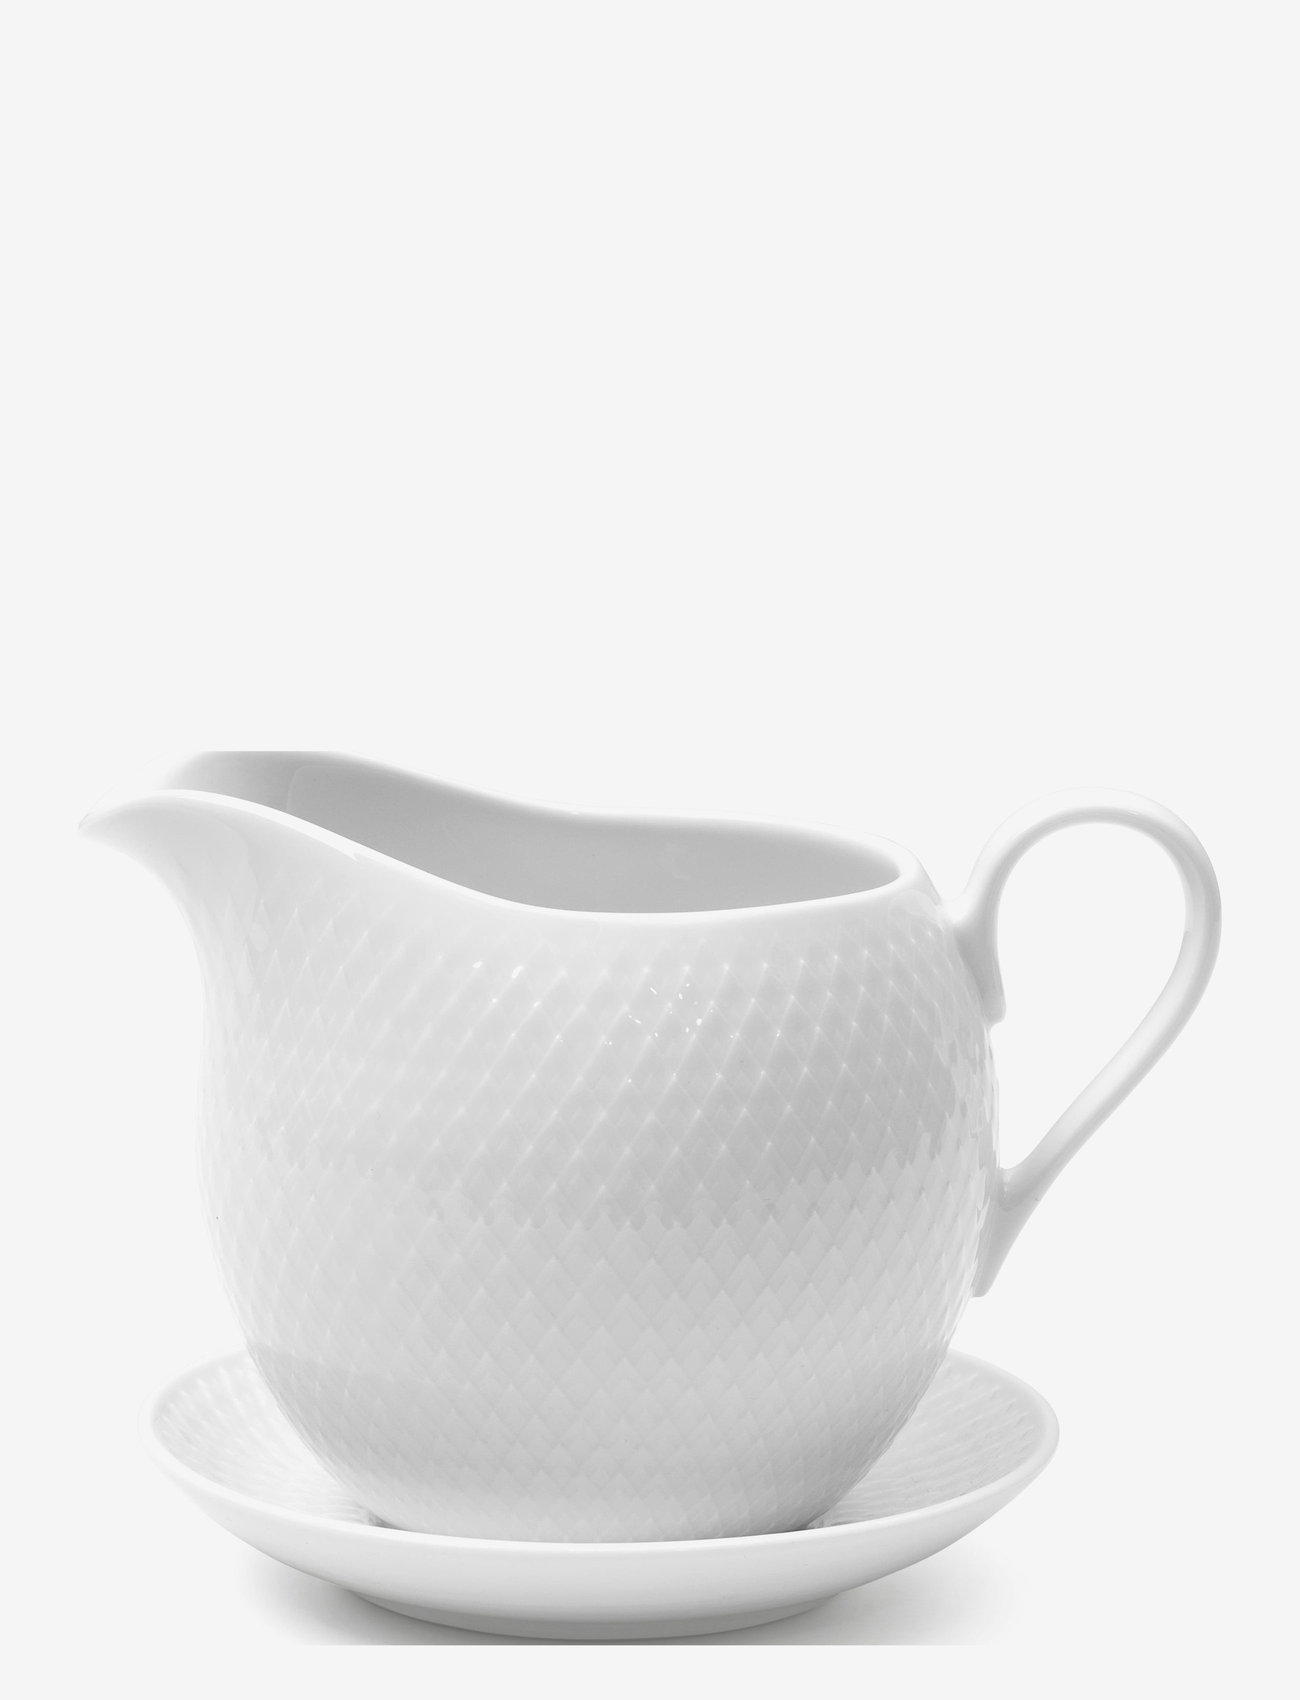 Lyngby Porcelæn - Rhombe Sausekanne 67 cl - sausenebb og sausekanner - white - 0